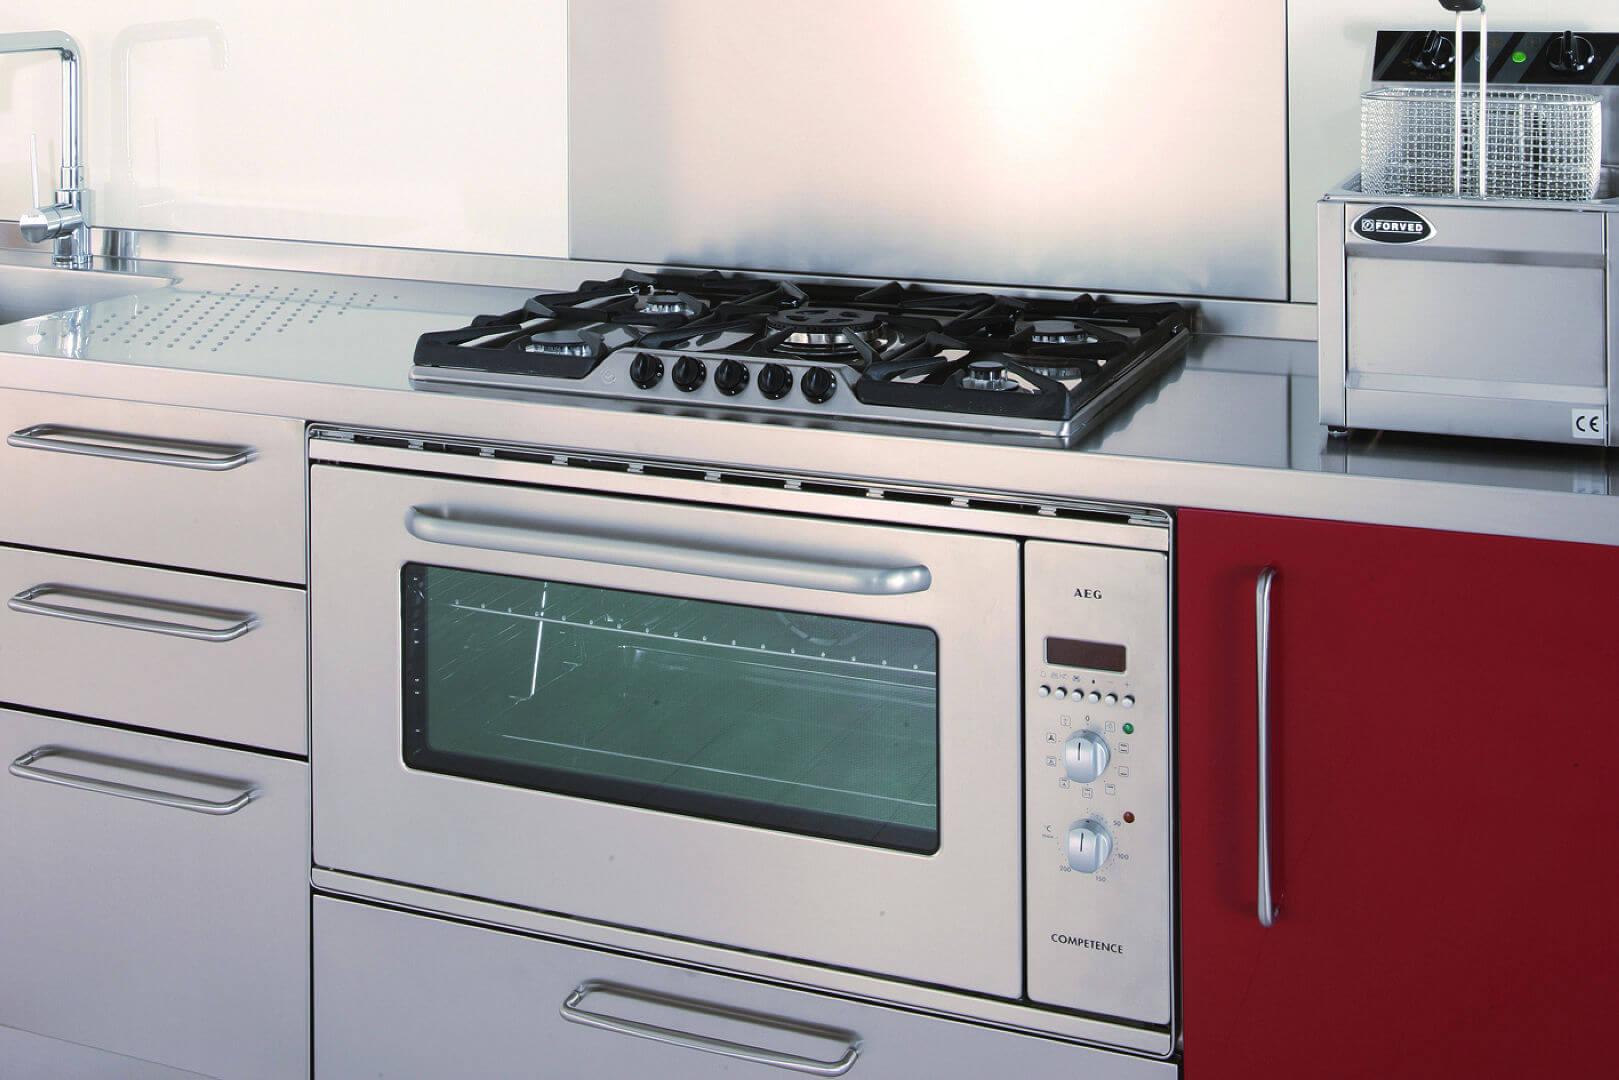 Arca Cucine Italia - Cucine Domestiche in Acciaio Inox - 13 - Gourmet - Blocco Cottura